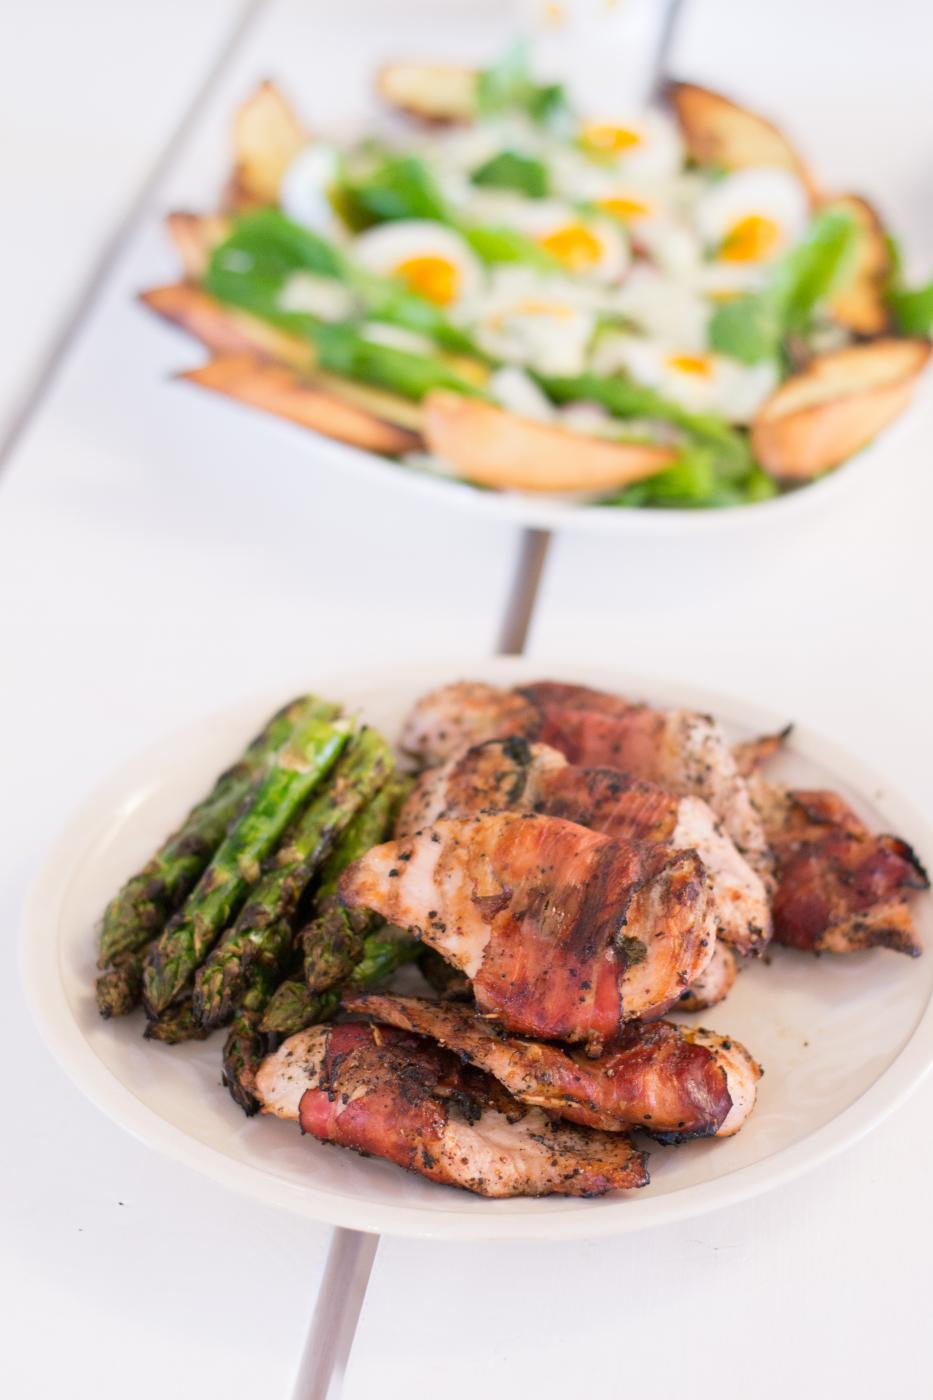 Broileri-saltimbocca grillissä